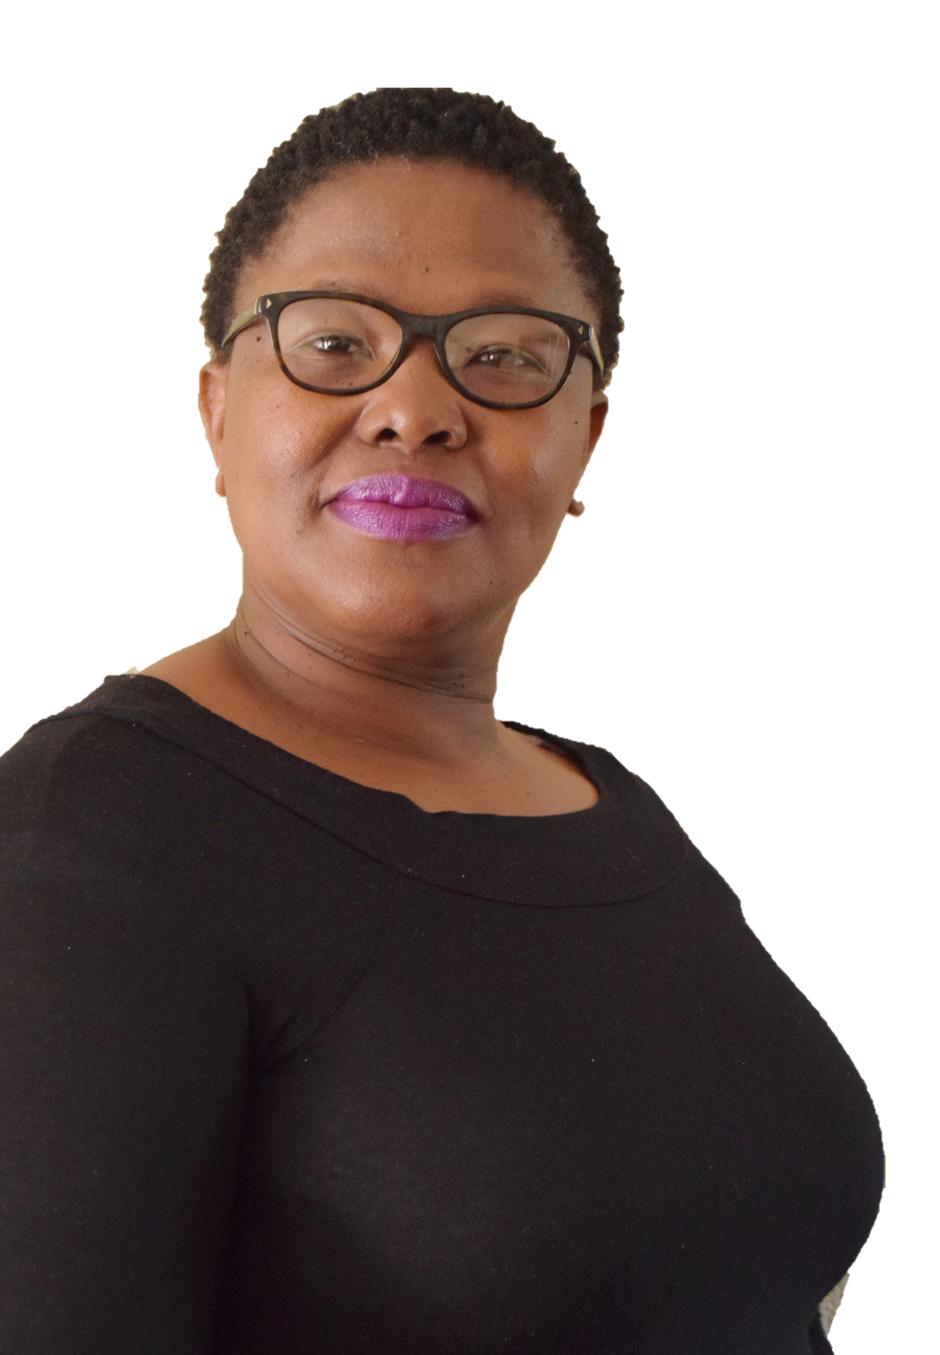 Real Estate Agent - Thobekile Msezane